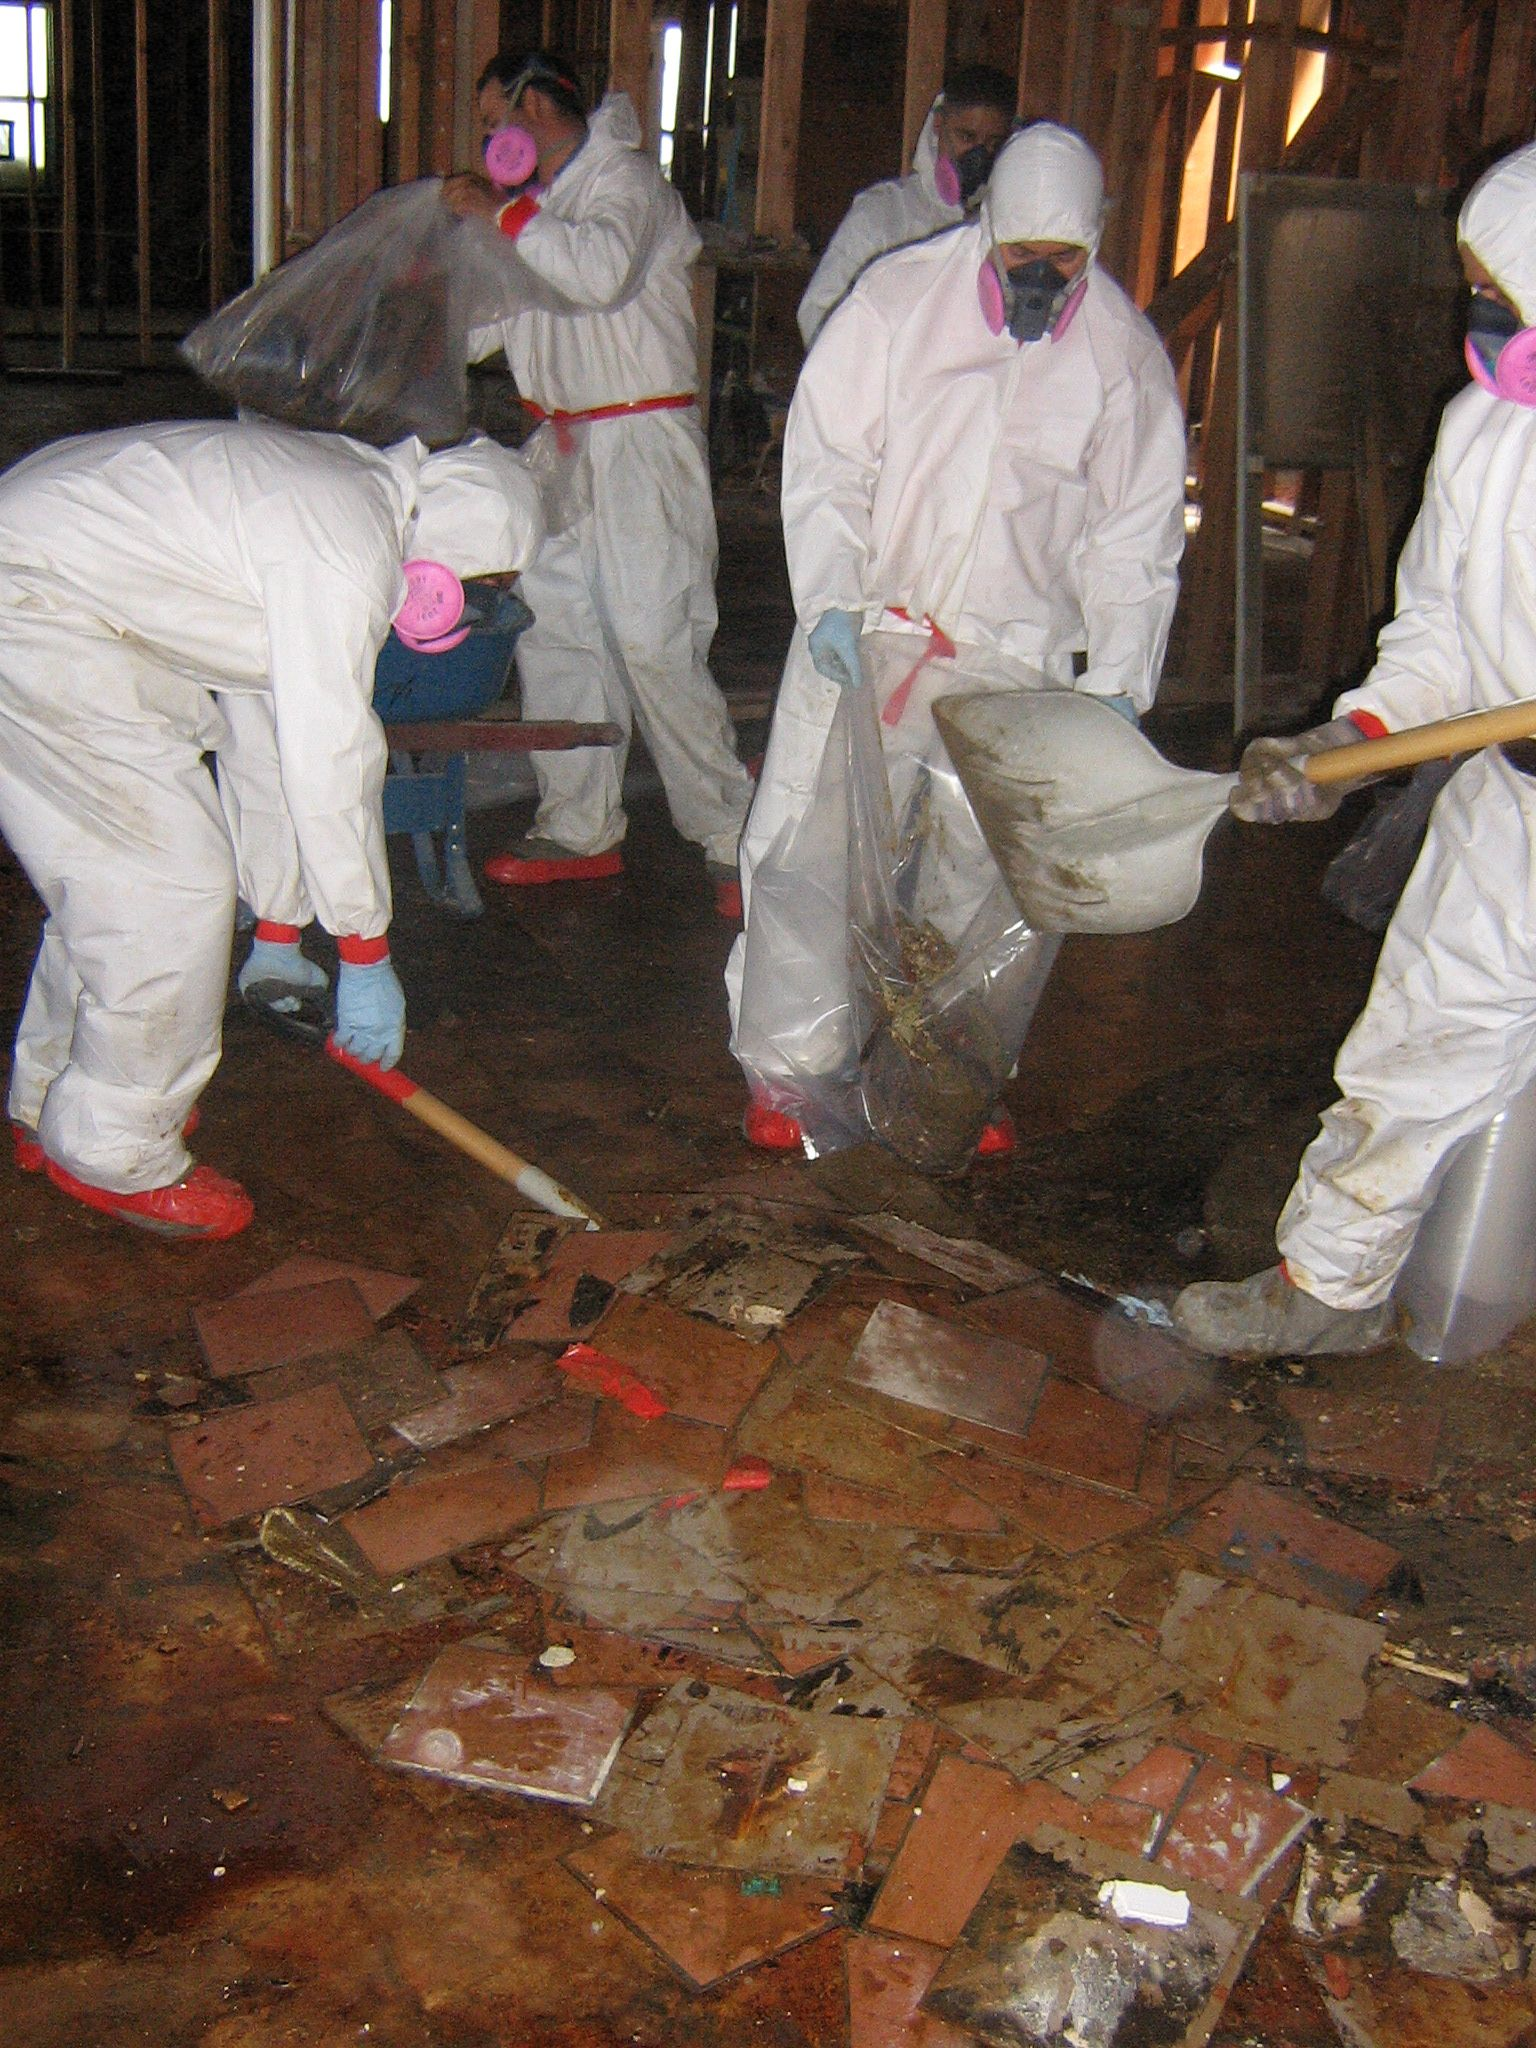 Biohazard Clean Up biohazard crime scene bio hazard